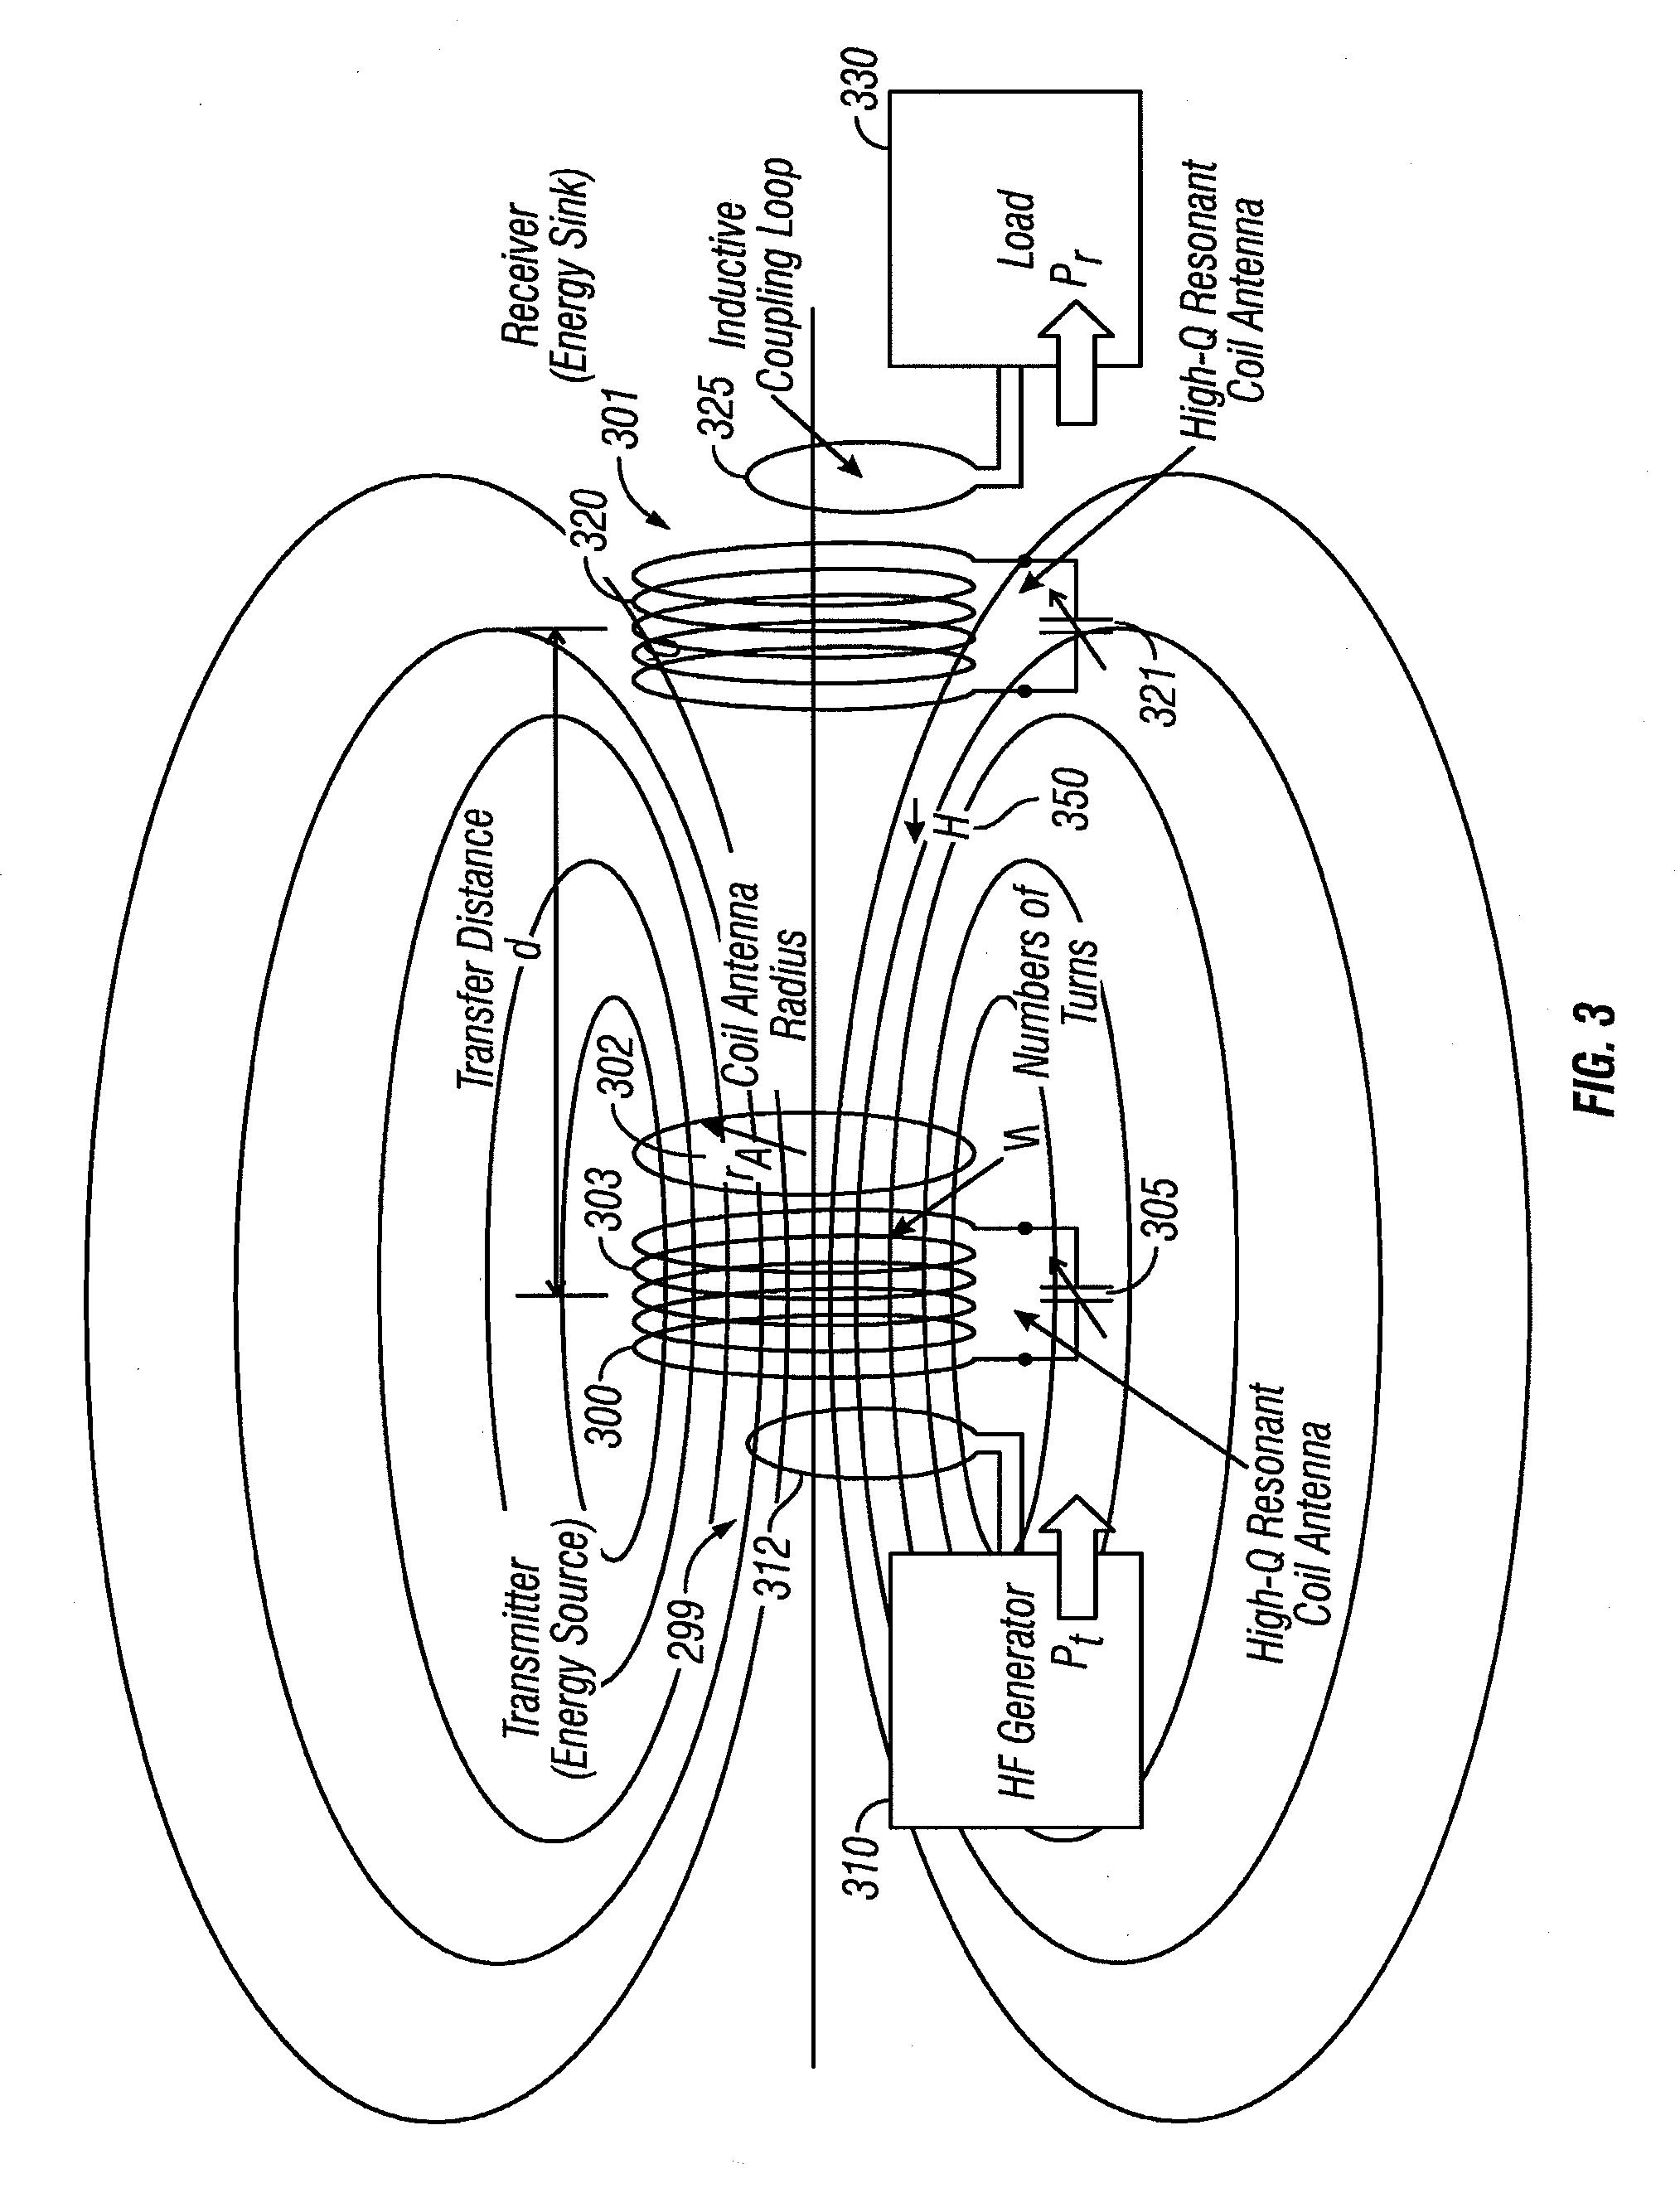 skutt wiring diagram bell wiring diagram wiring diagram